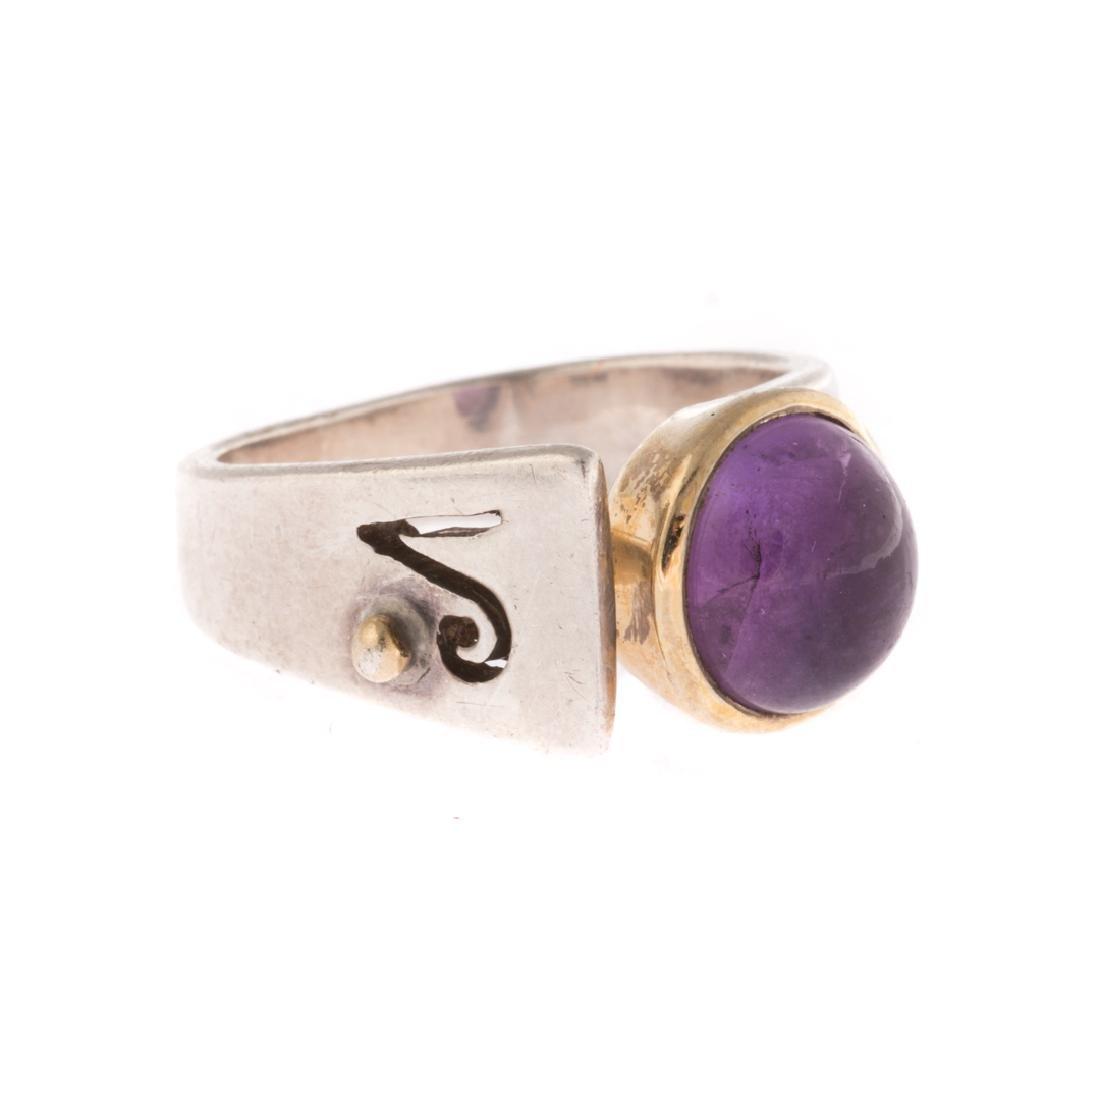 A Contemporary Amethyst Ring & Garnet Earrings - 3